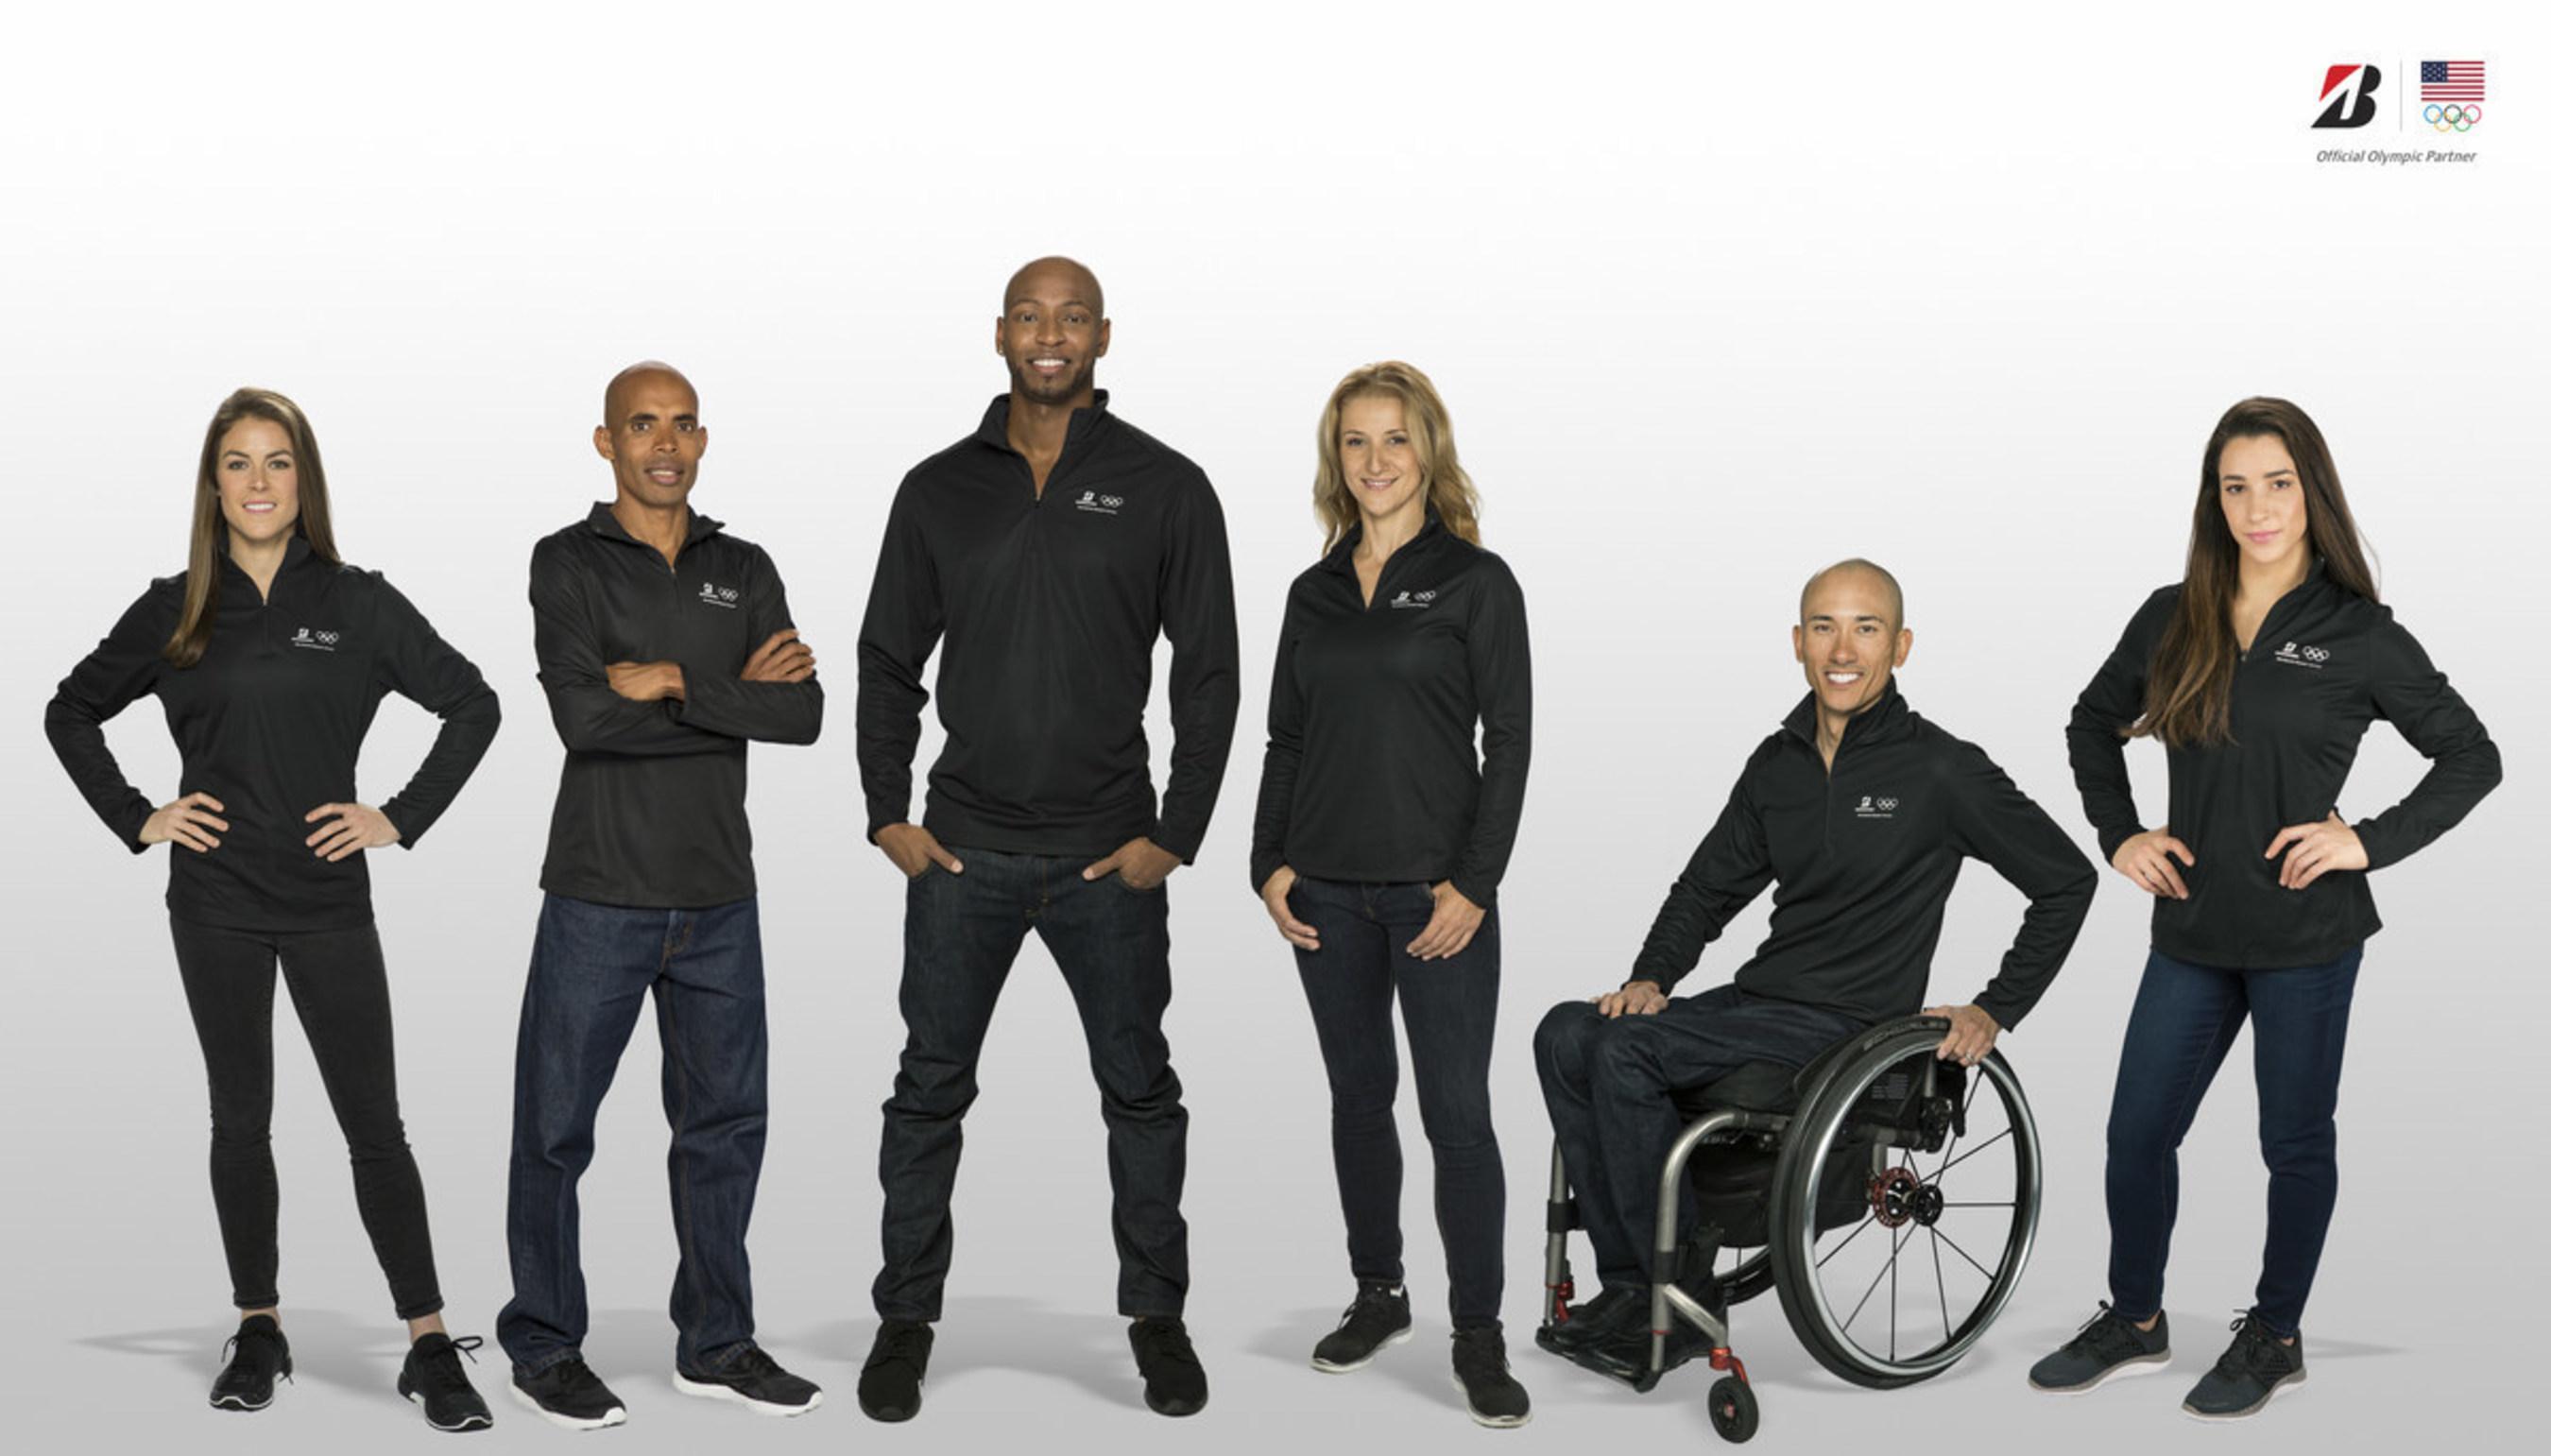 Bridgestone Becomes Worldwide Paralympic Partner